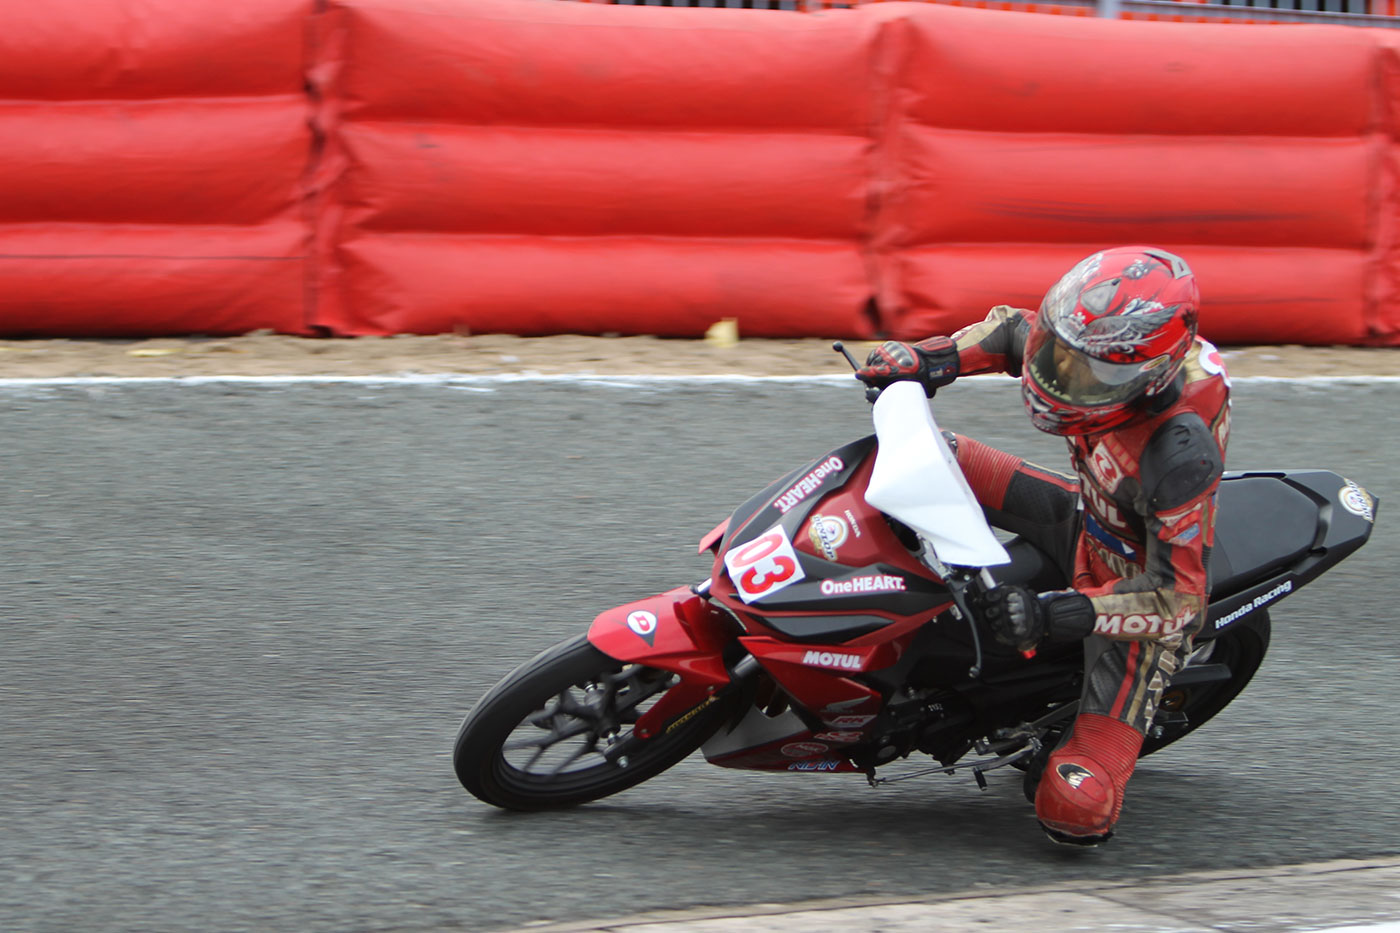 tay-dua-nguyen-thanh-vu-honda-racing-08.jpg